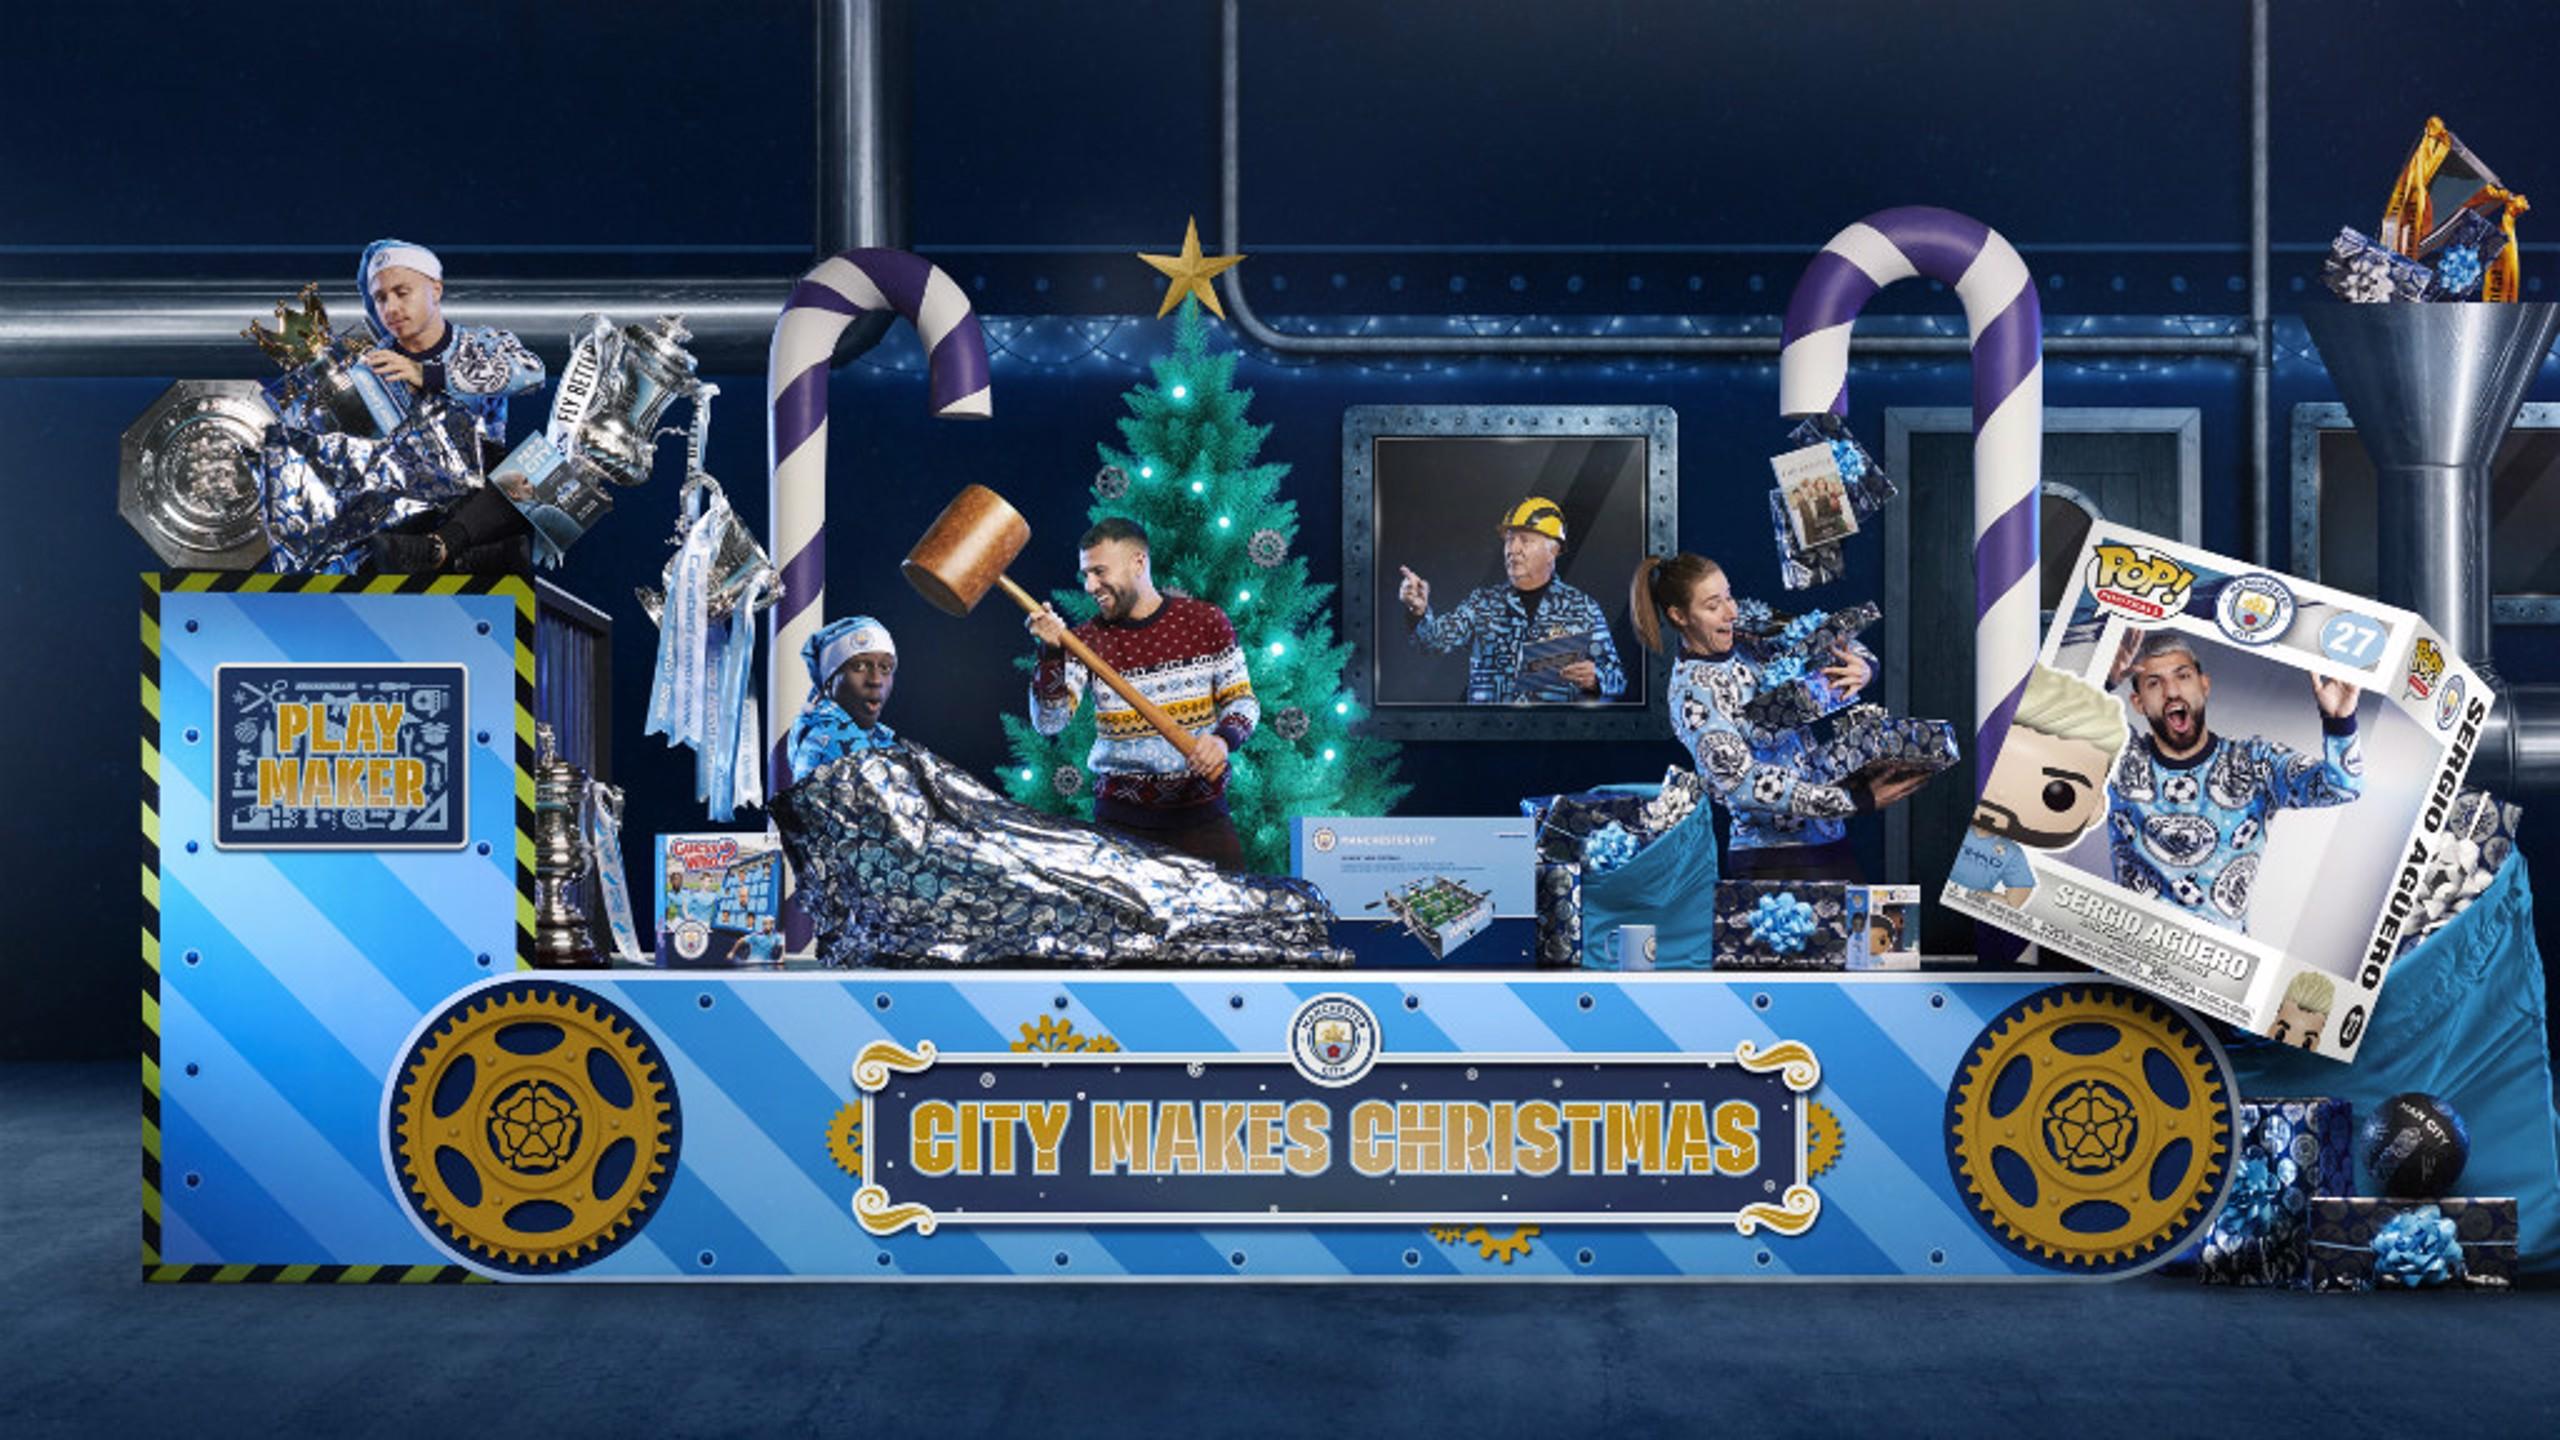 MAKING CHRISTMAS: The City stars hard at work in Santa's workshop.